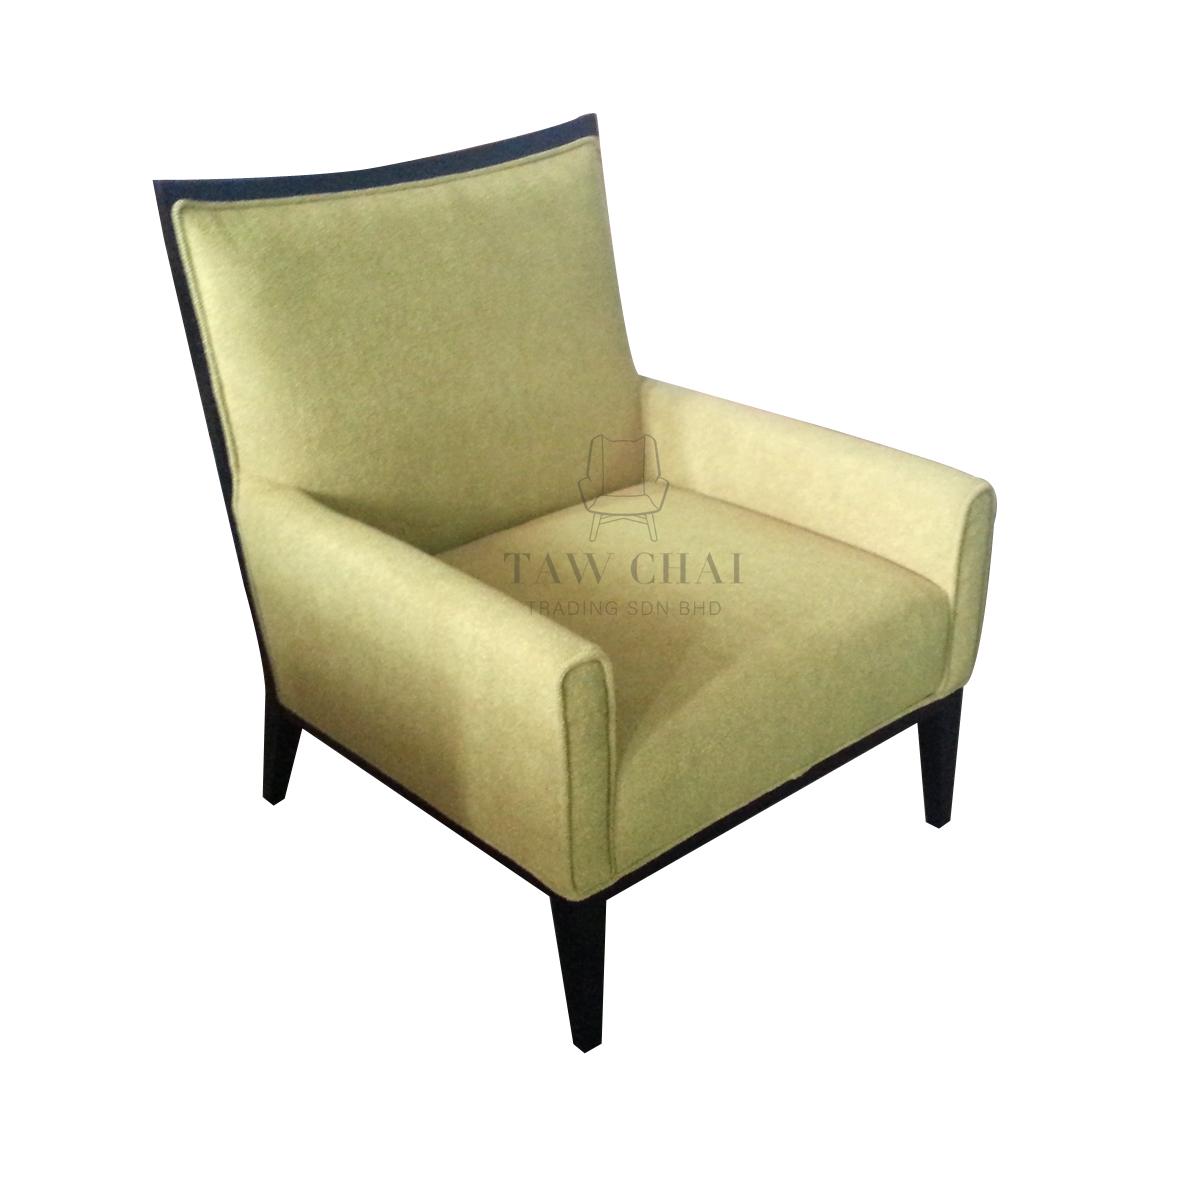 Taw Chai Furniture Product